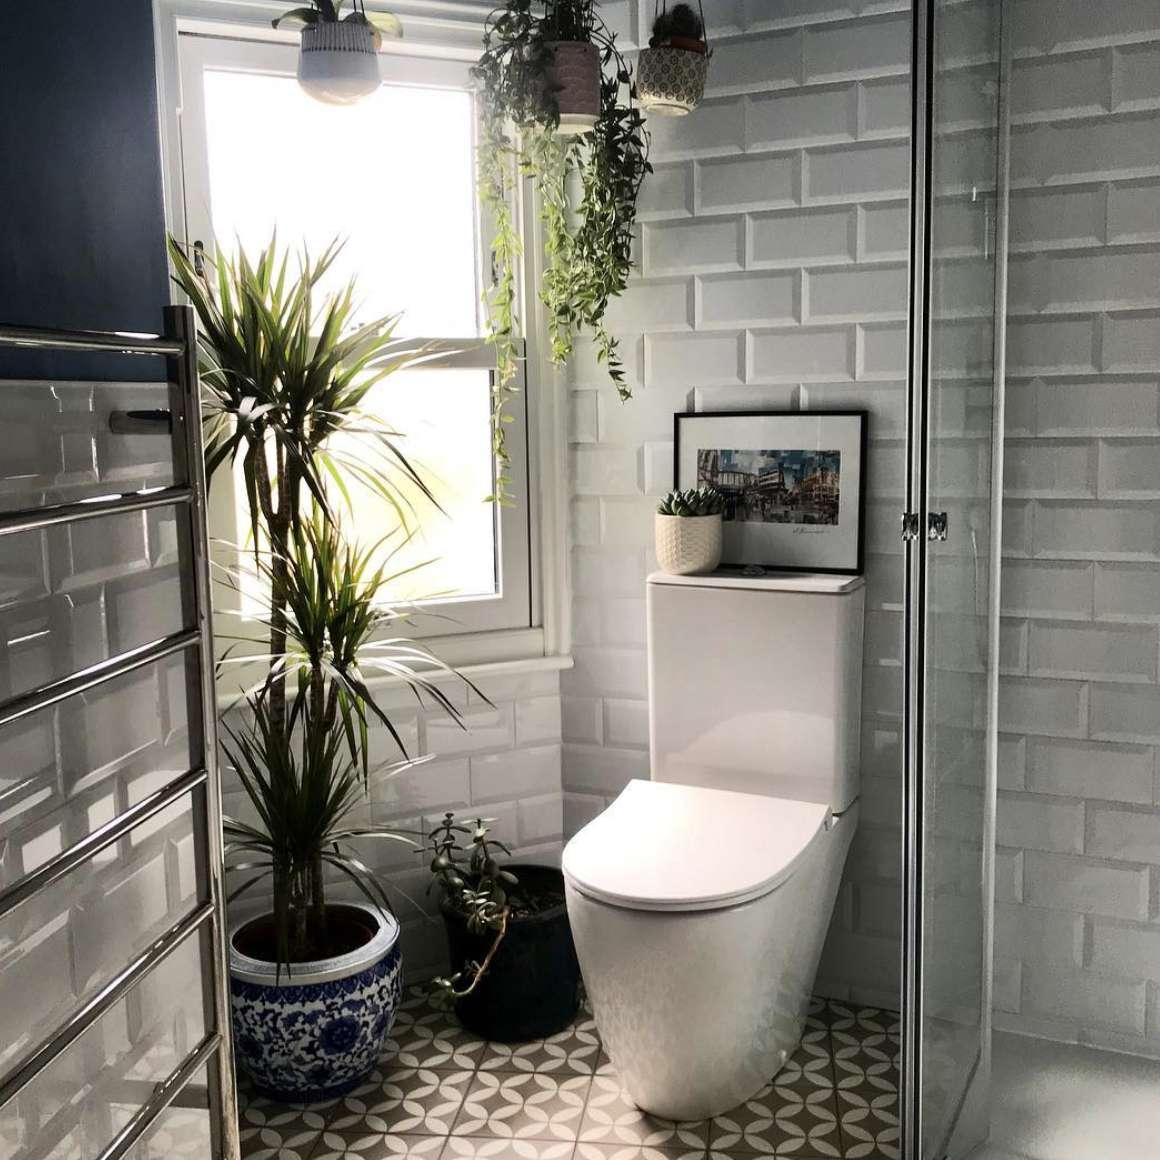 Bathroom with hanging plants